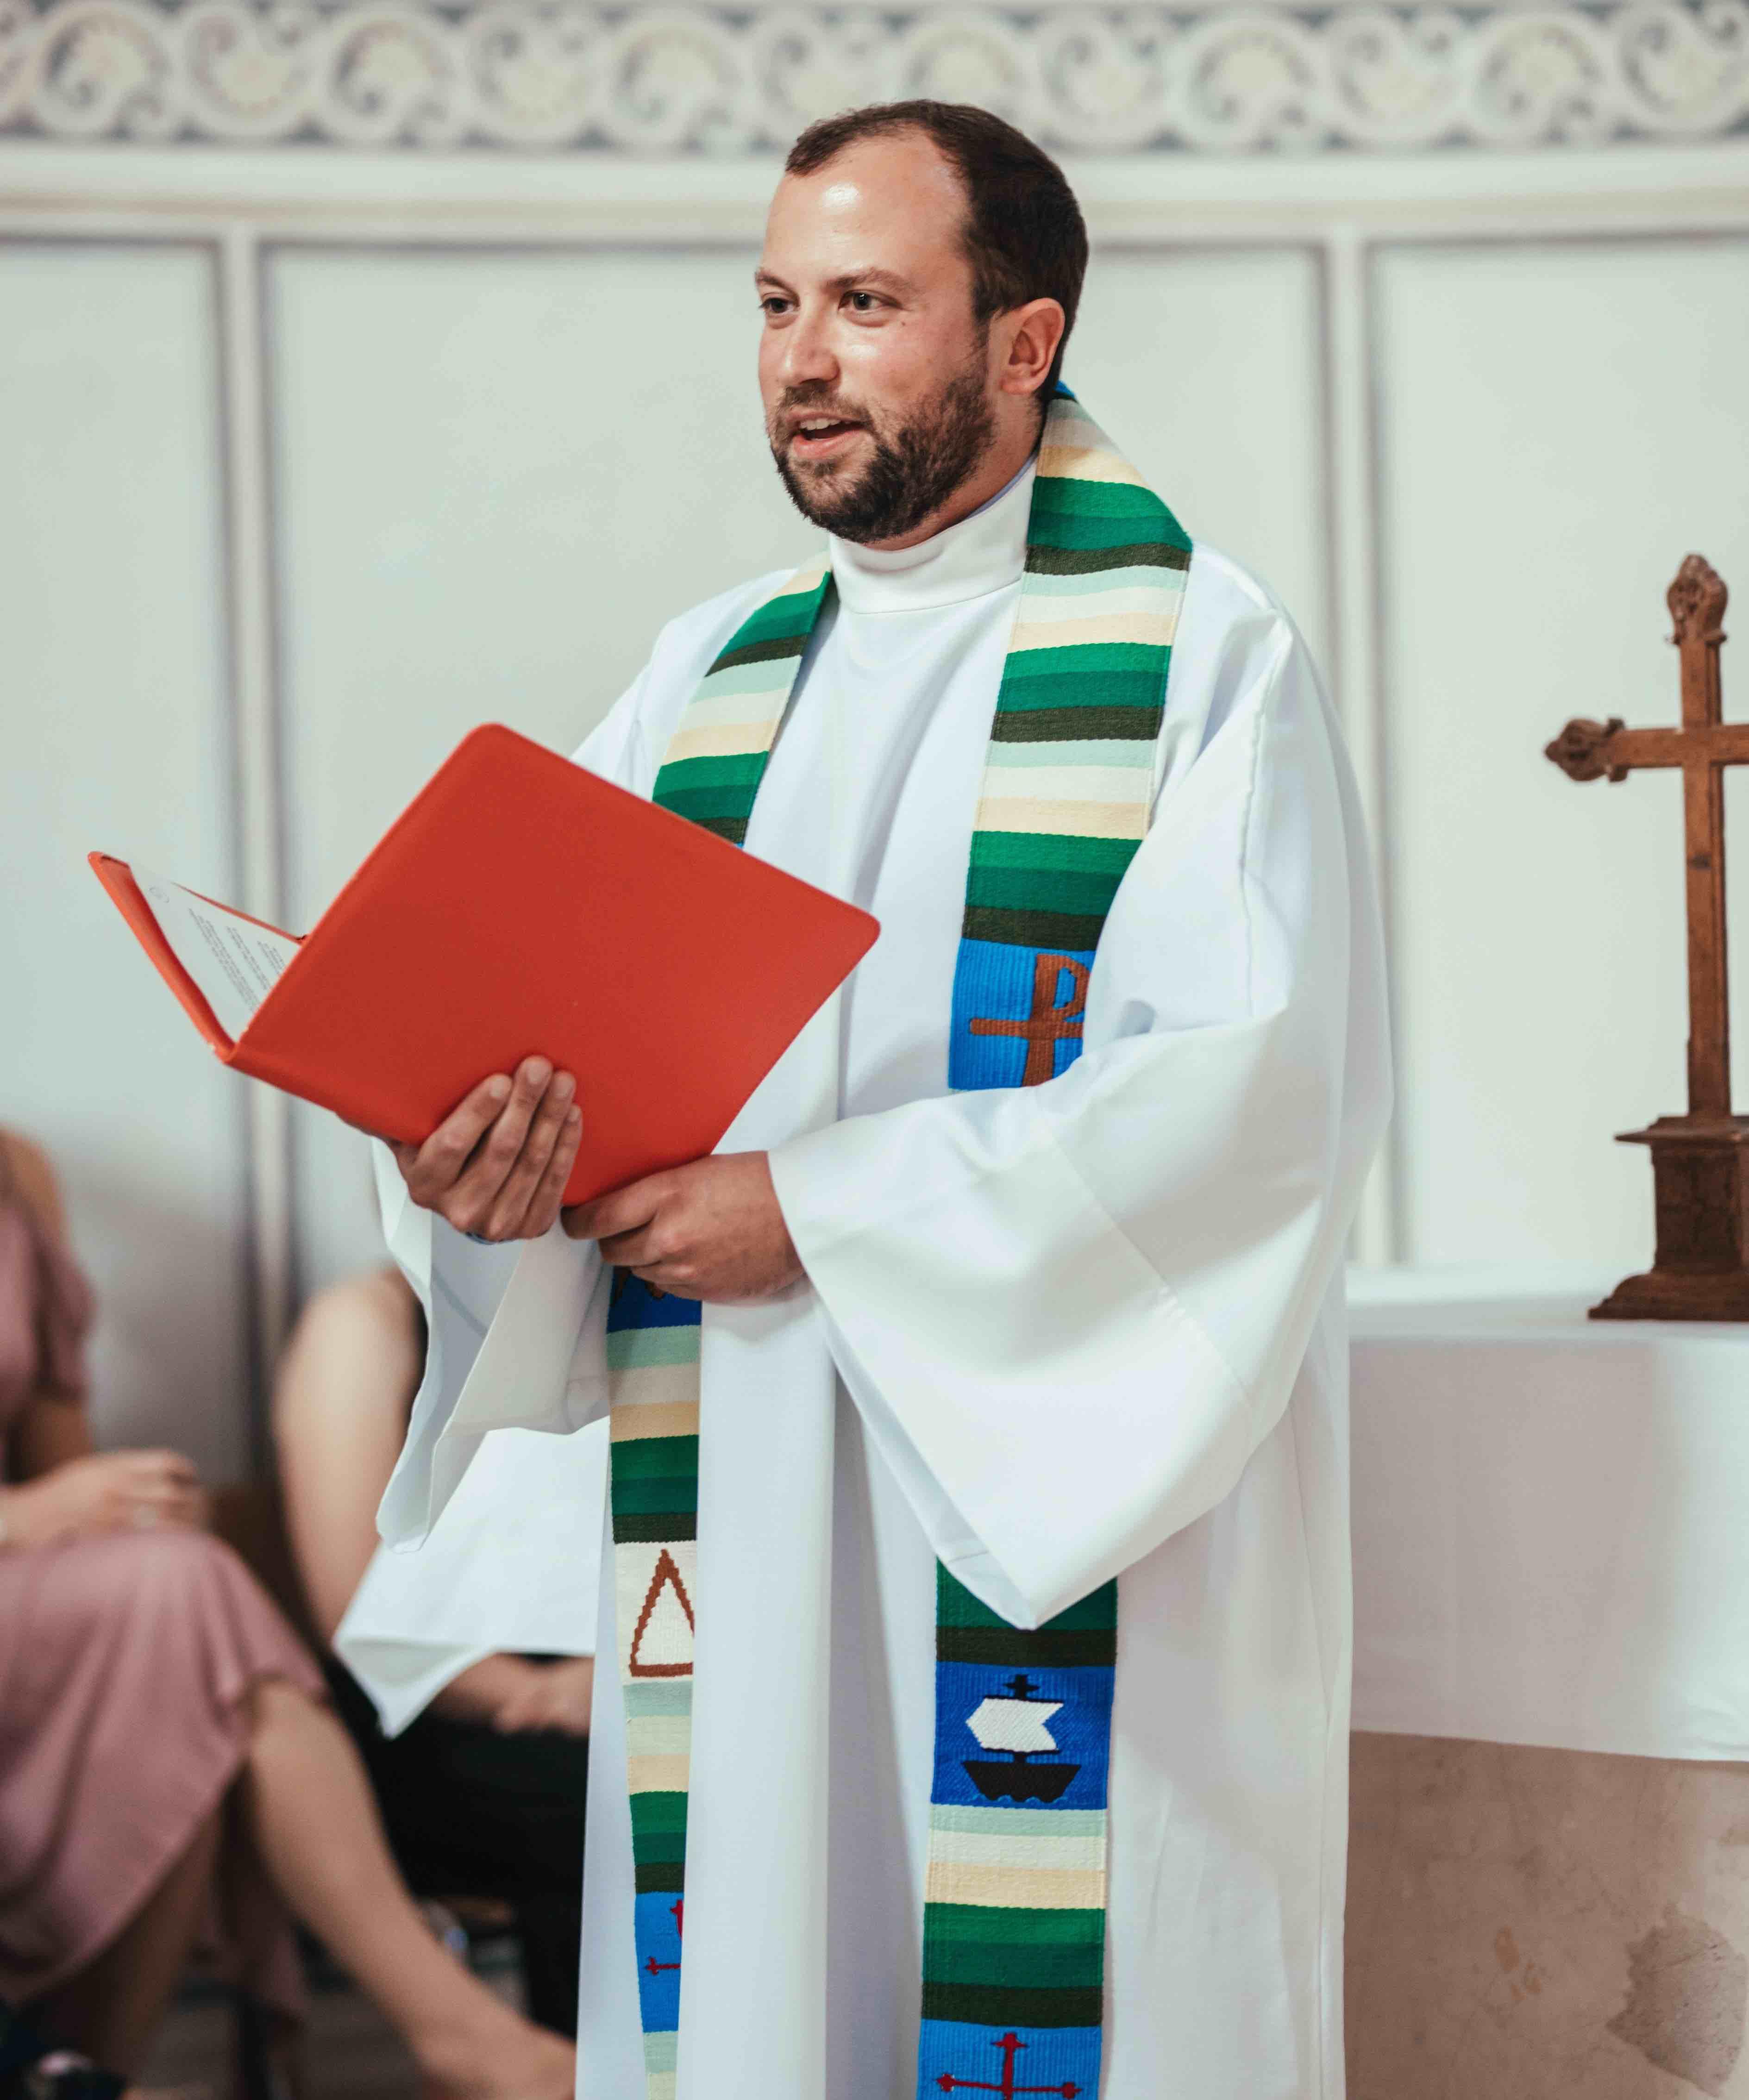 Rev. Joseph Graumann, Jr.